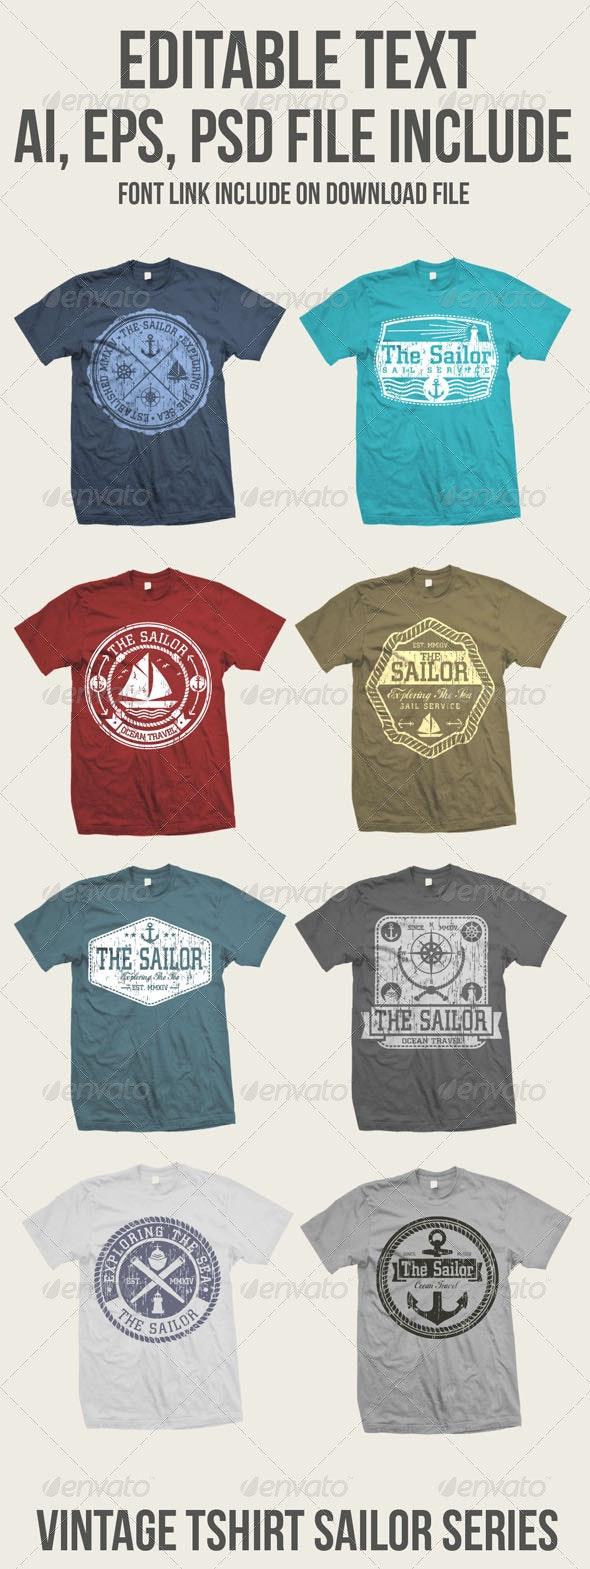 8 Vintage Sailor Tshirt  - T-Shirts